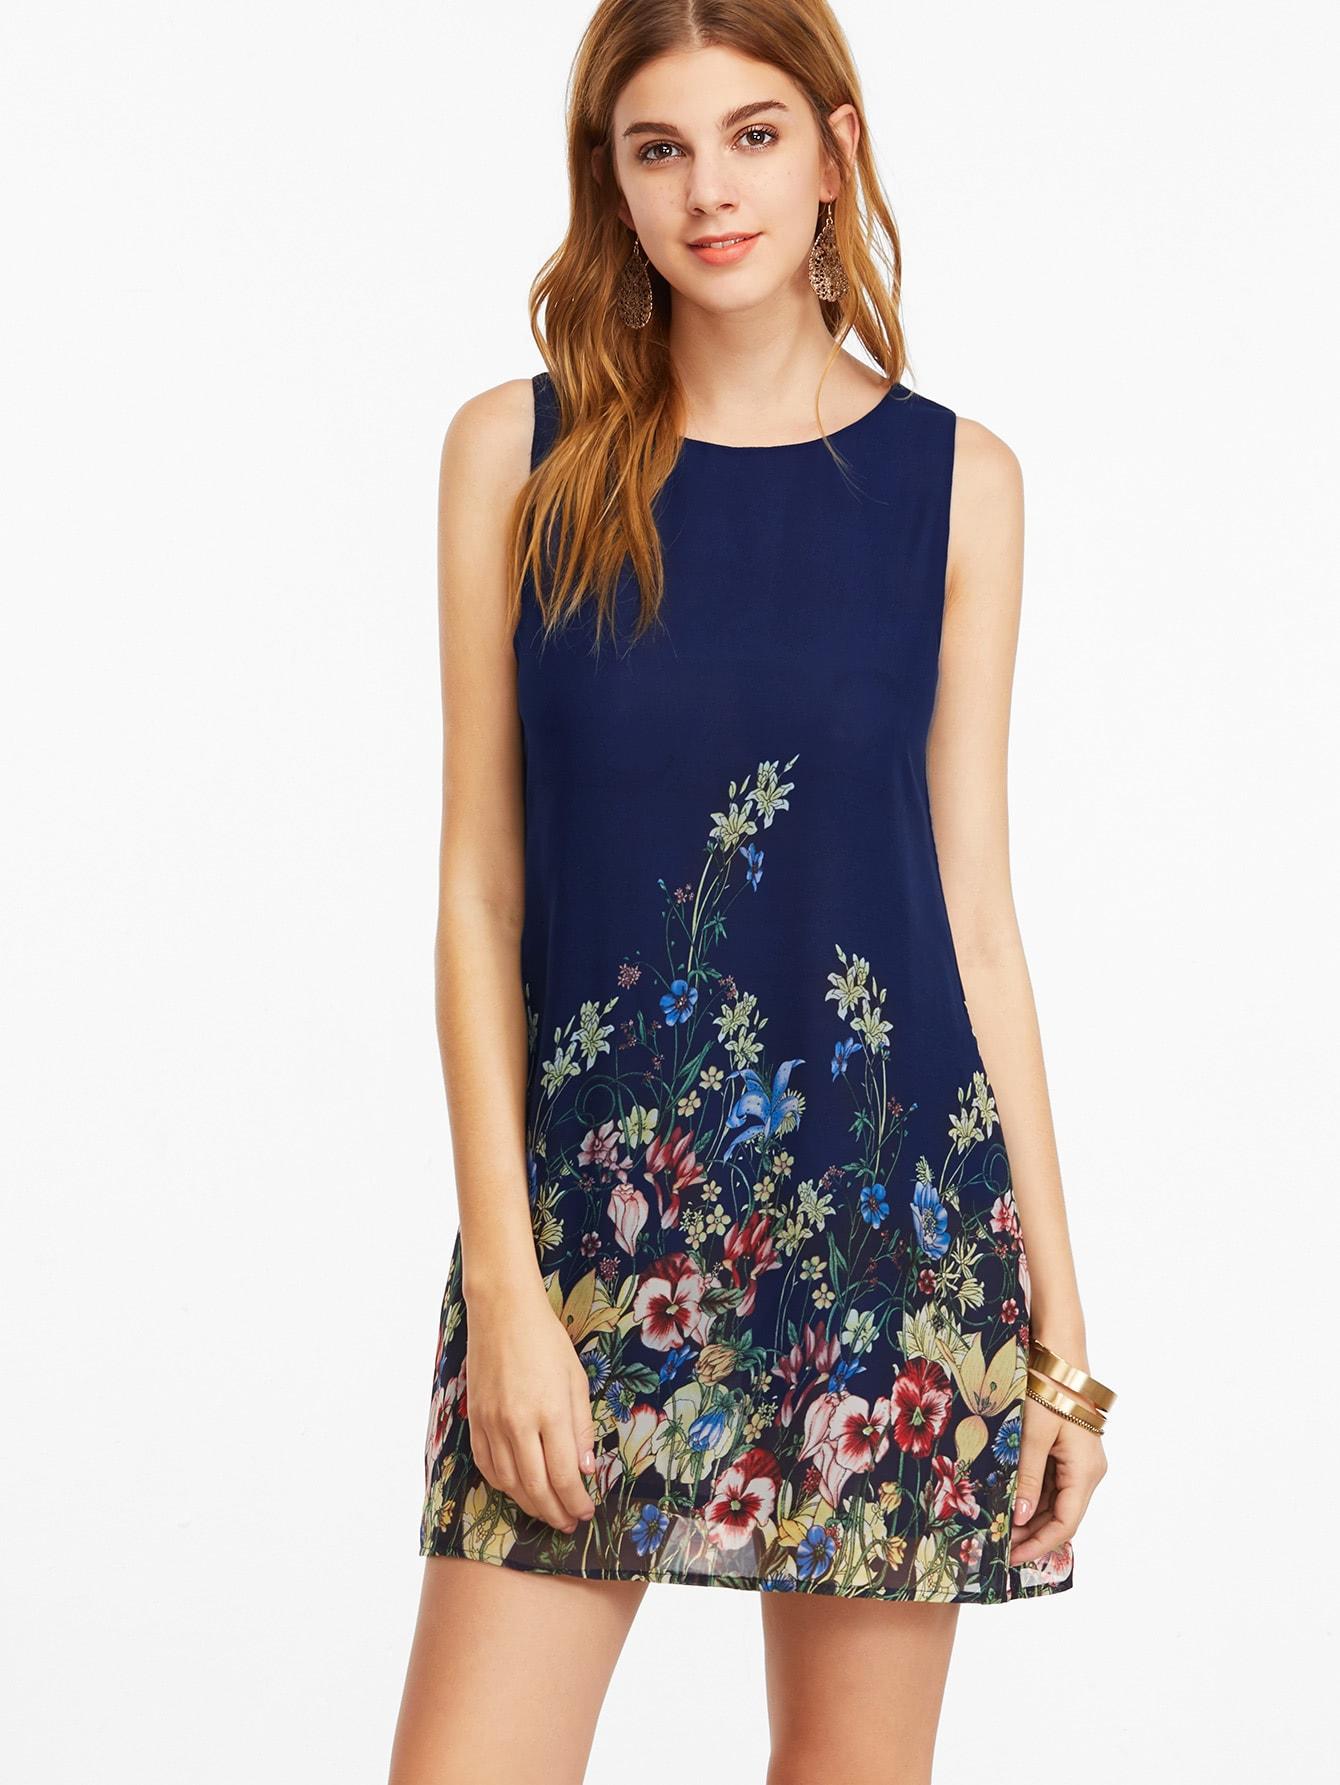 Navy Buttoned Keyhole Back Flower Print Sleeveless Dress